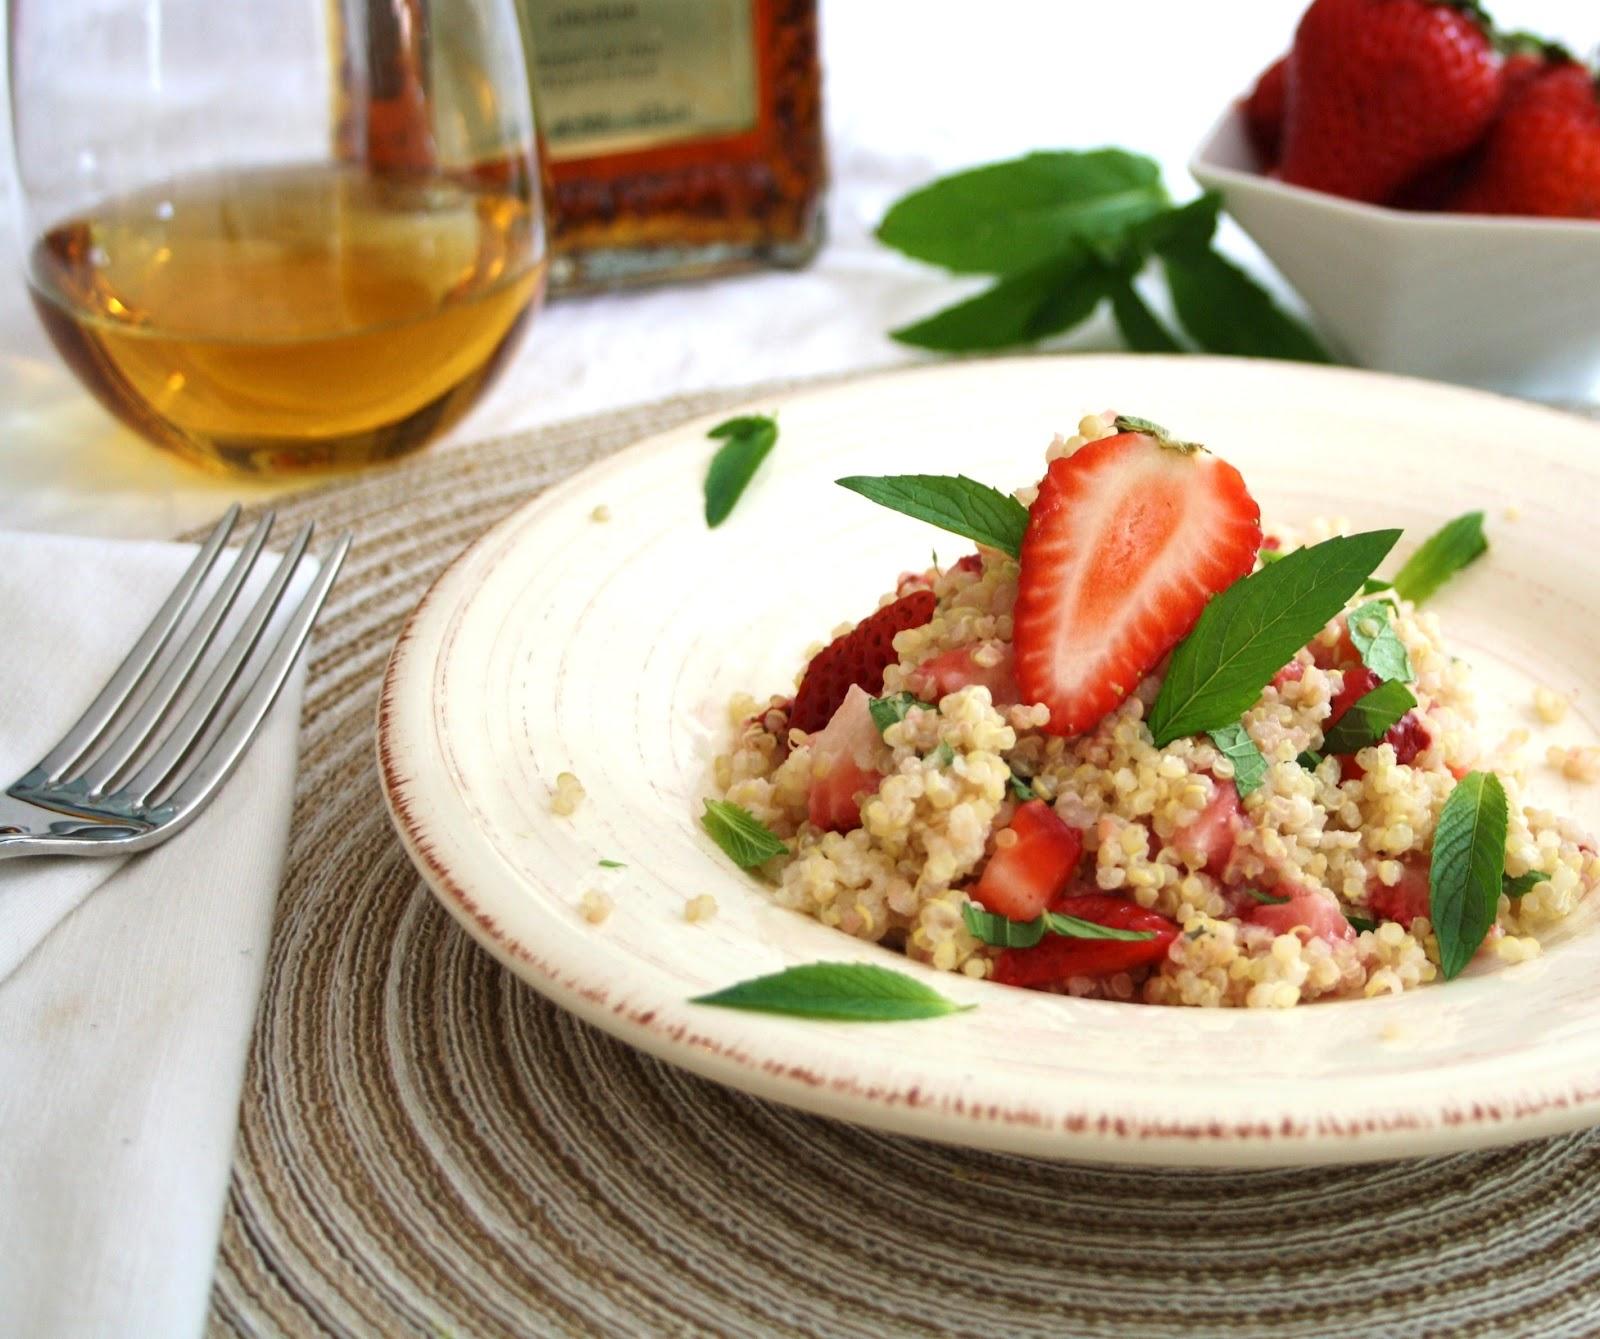 http://3.bp.blogspot.com/-2TP9EOZrx10/T8PRz3cBAEI/AAAAAAAADKs/GrXKzzS7XV0/s1600/strawberry+minted+quinoa_2.jpg